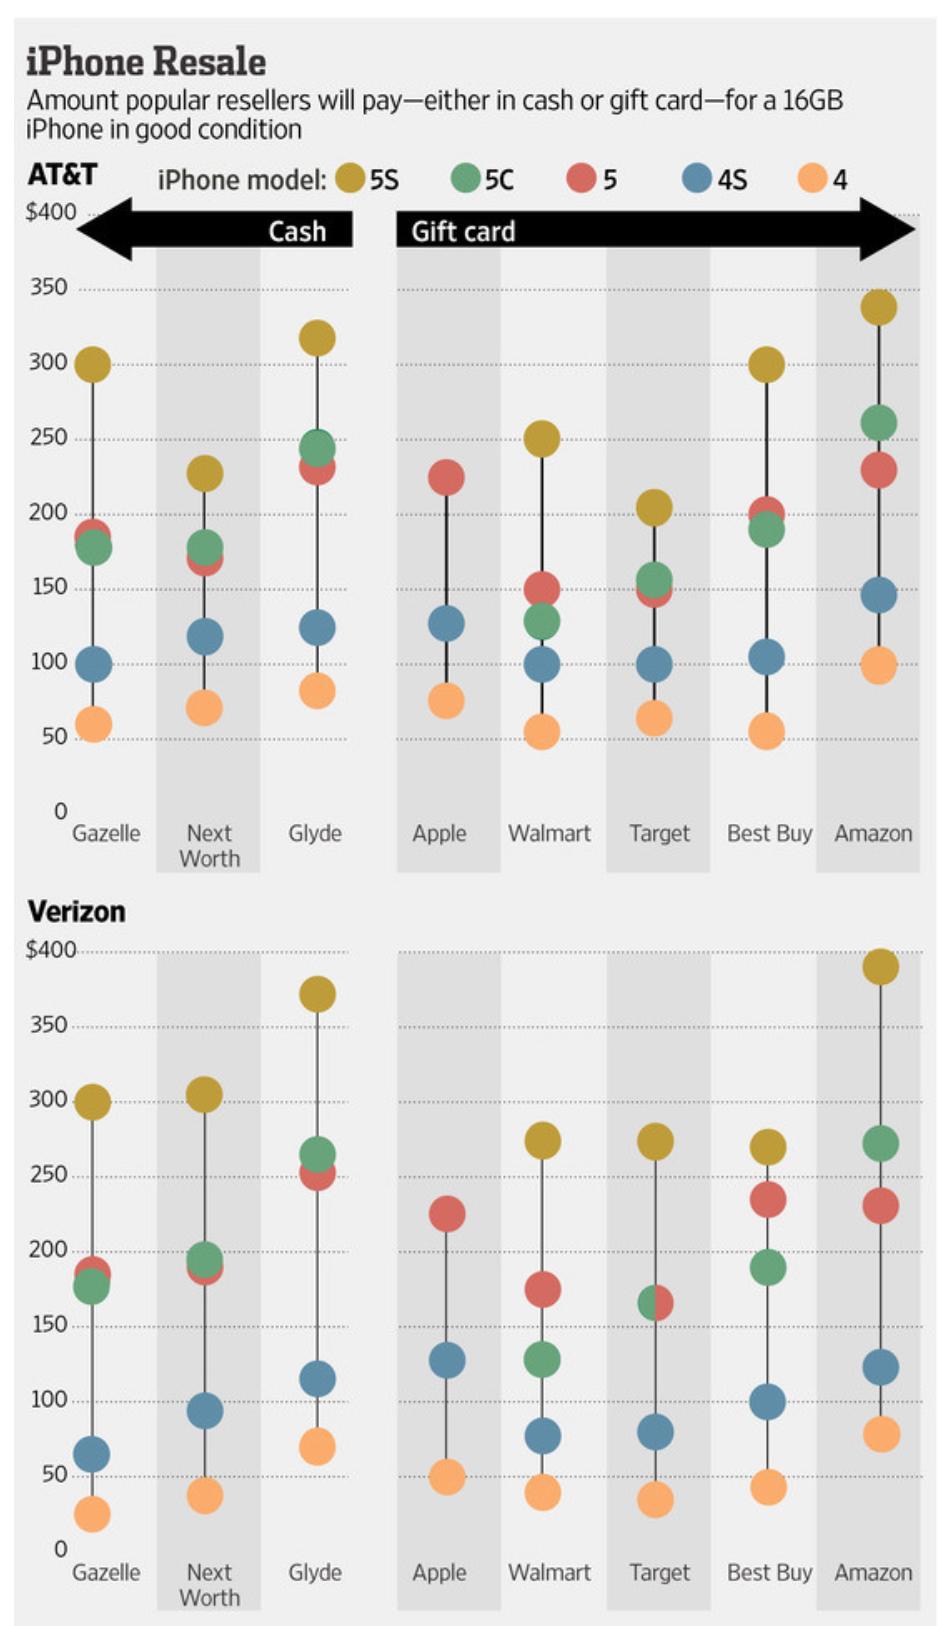 iPhone Resale price comparison (Source: via 9to5mac)